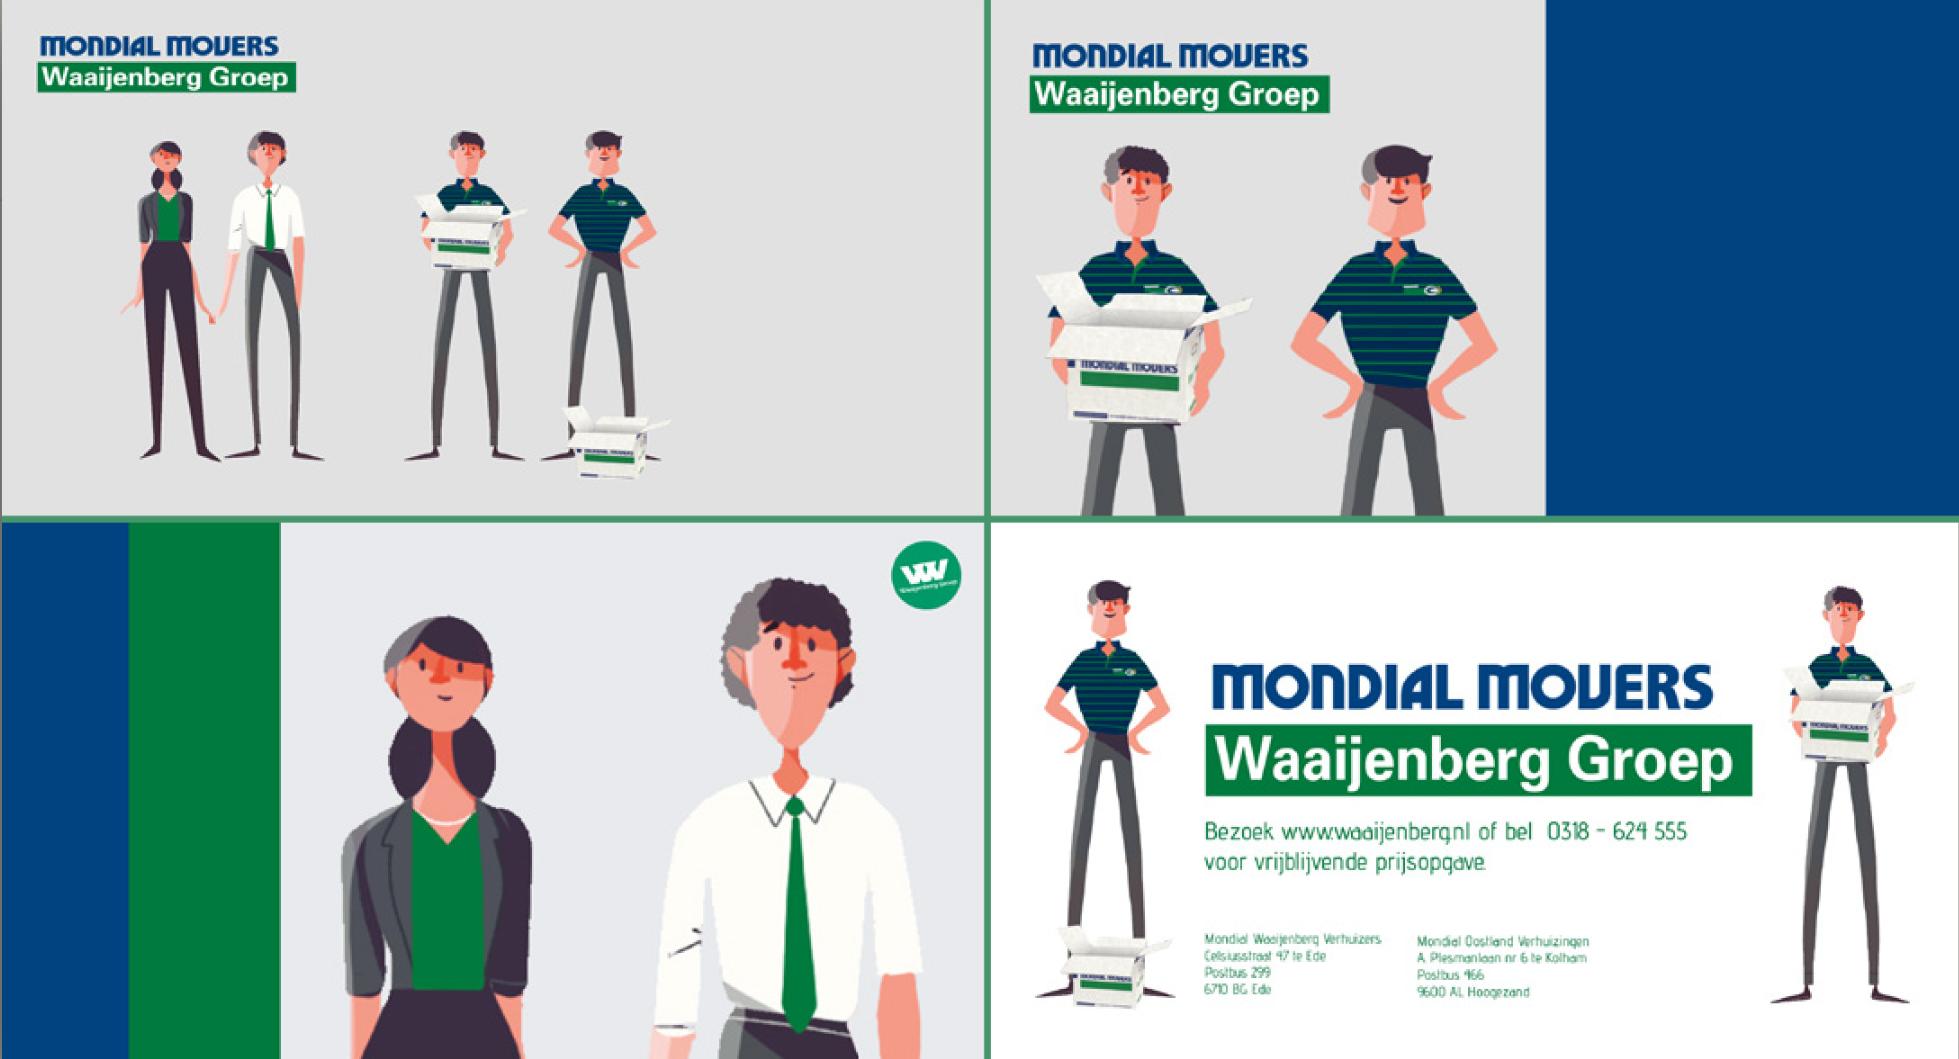 MondialWaaijenberggroep-styleframes.png